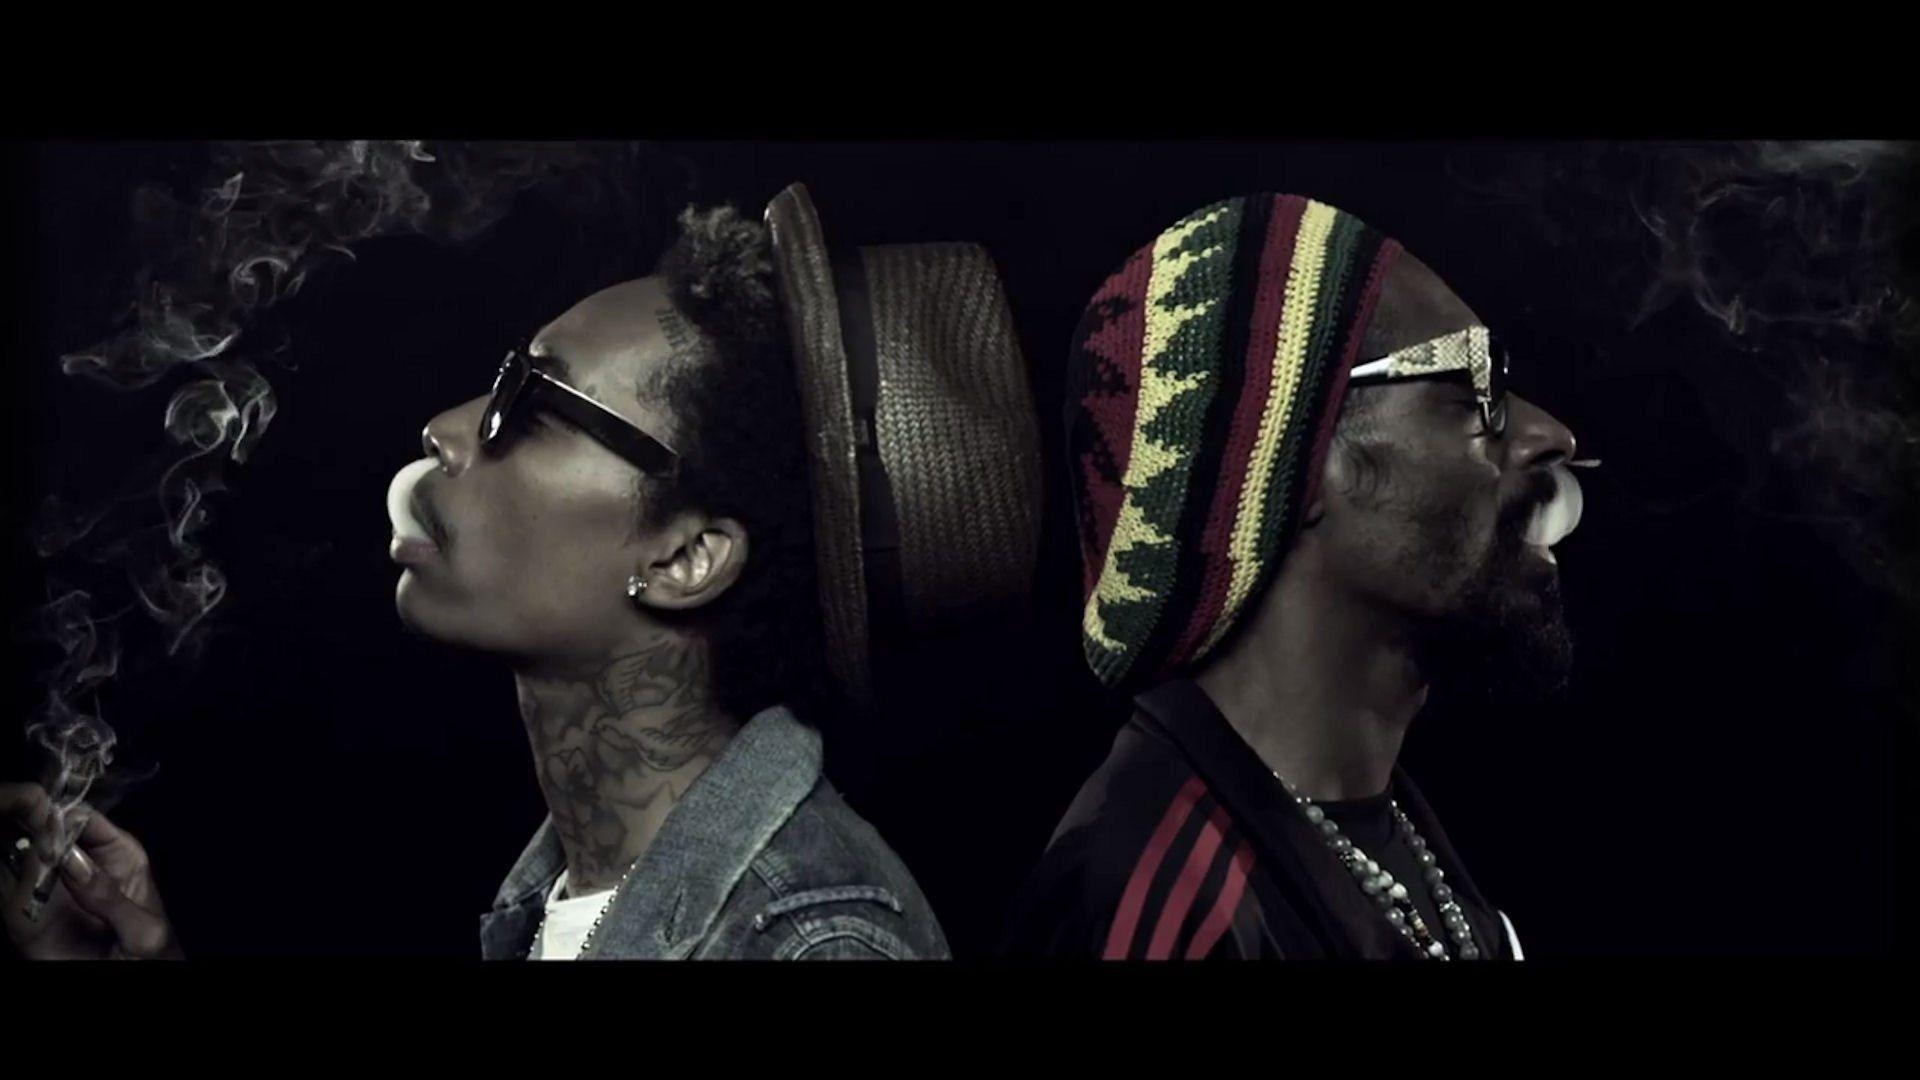 1920x1080 Wiz Khalifa Snoop Dogg Hip Hop Rapper Rap Singer